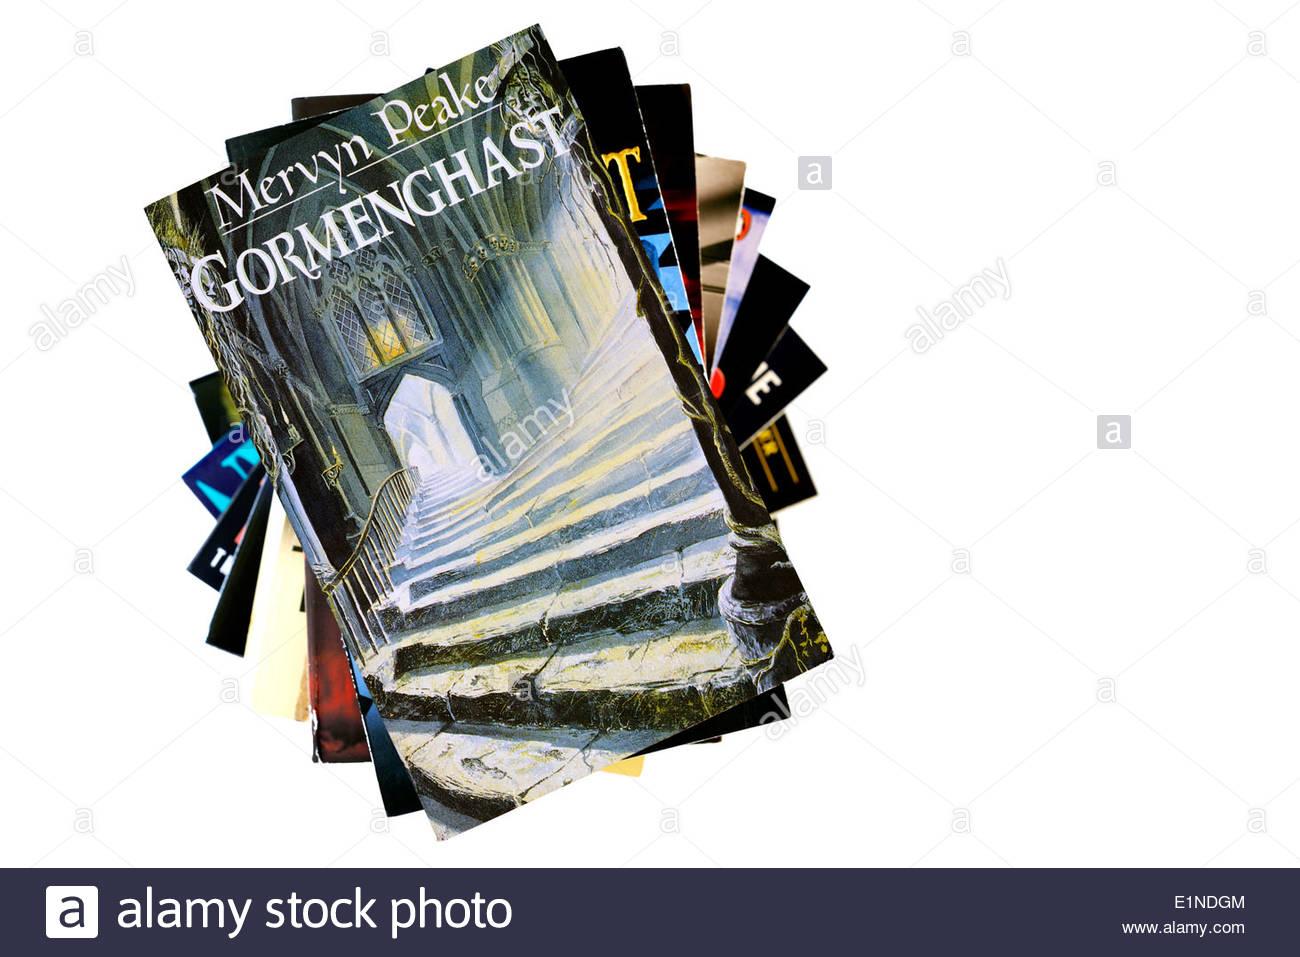 Mervyn Peake paperback title Gormenghast,  stacked used books, England - Stock Image